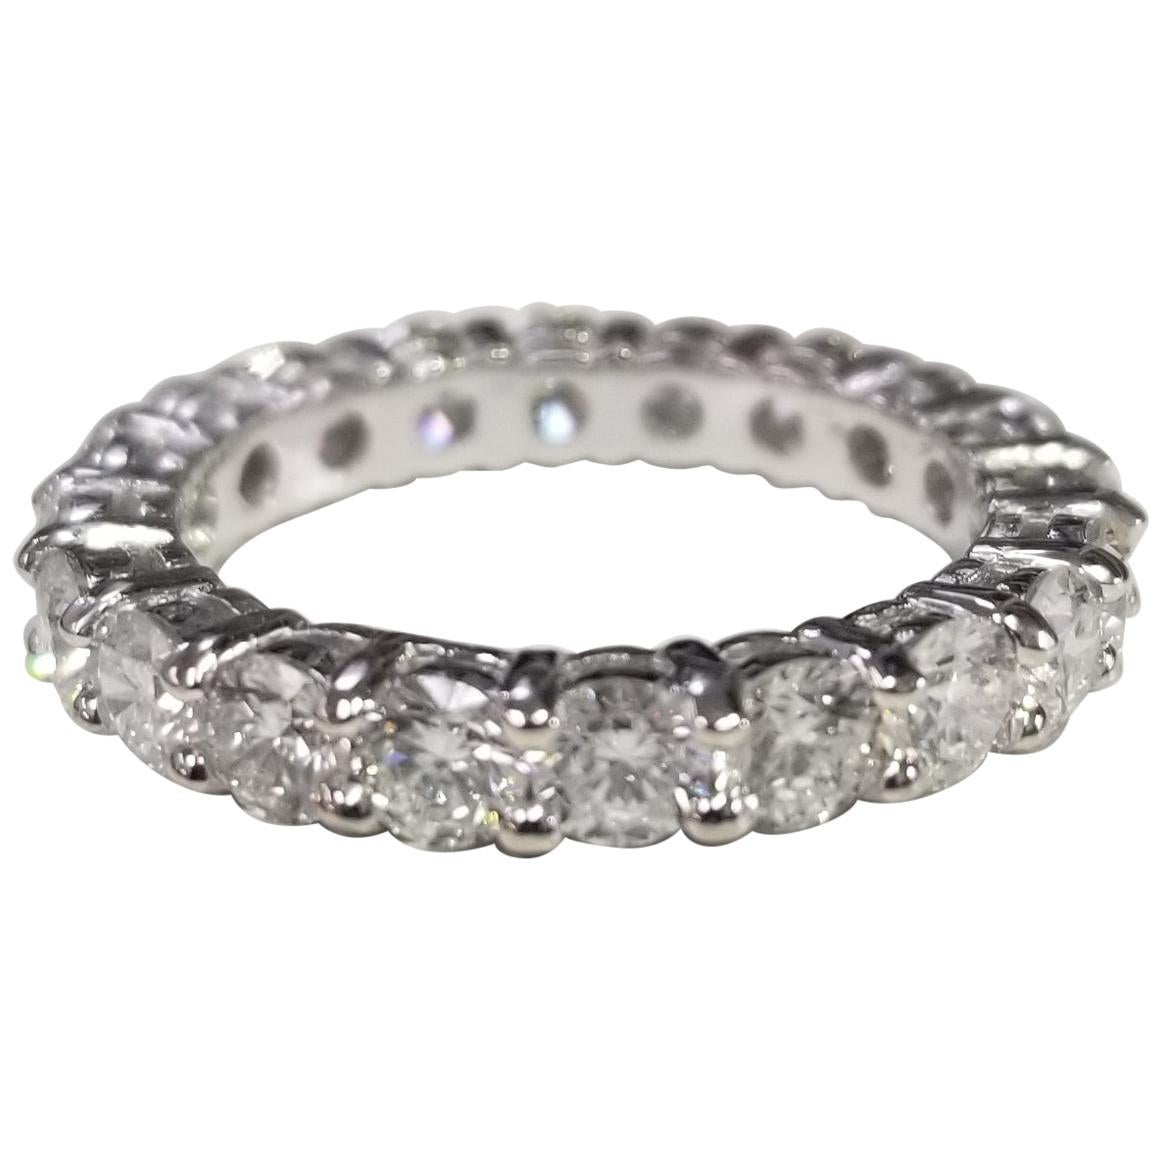 14 Karat White Gold Diamond 2.50 Carat Eternity Ring with Shared Prongs